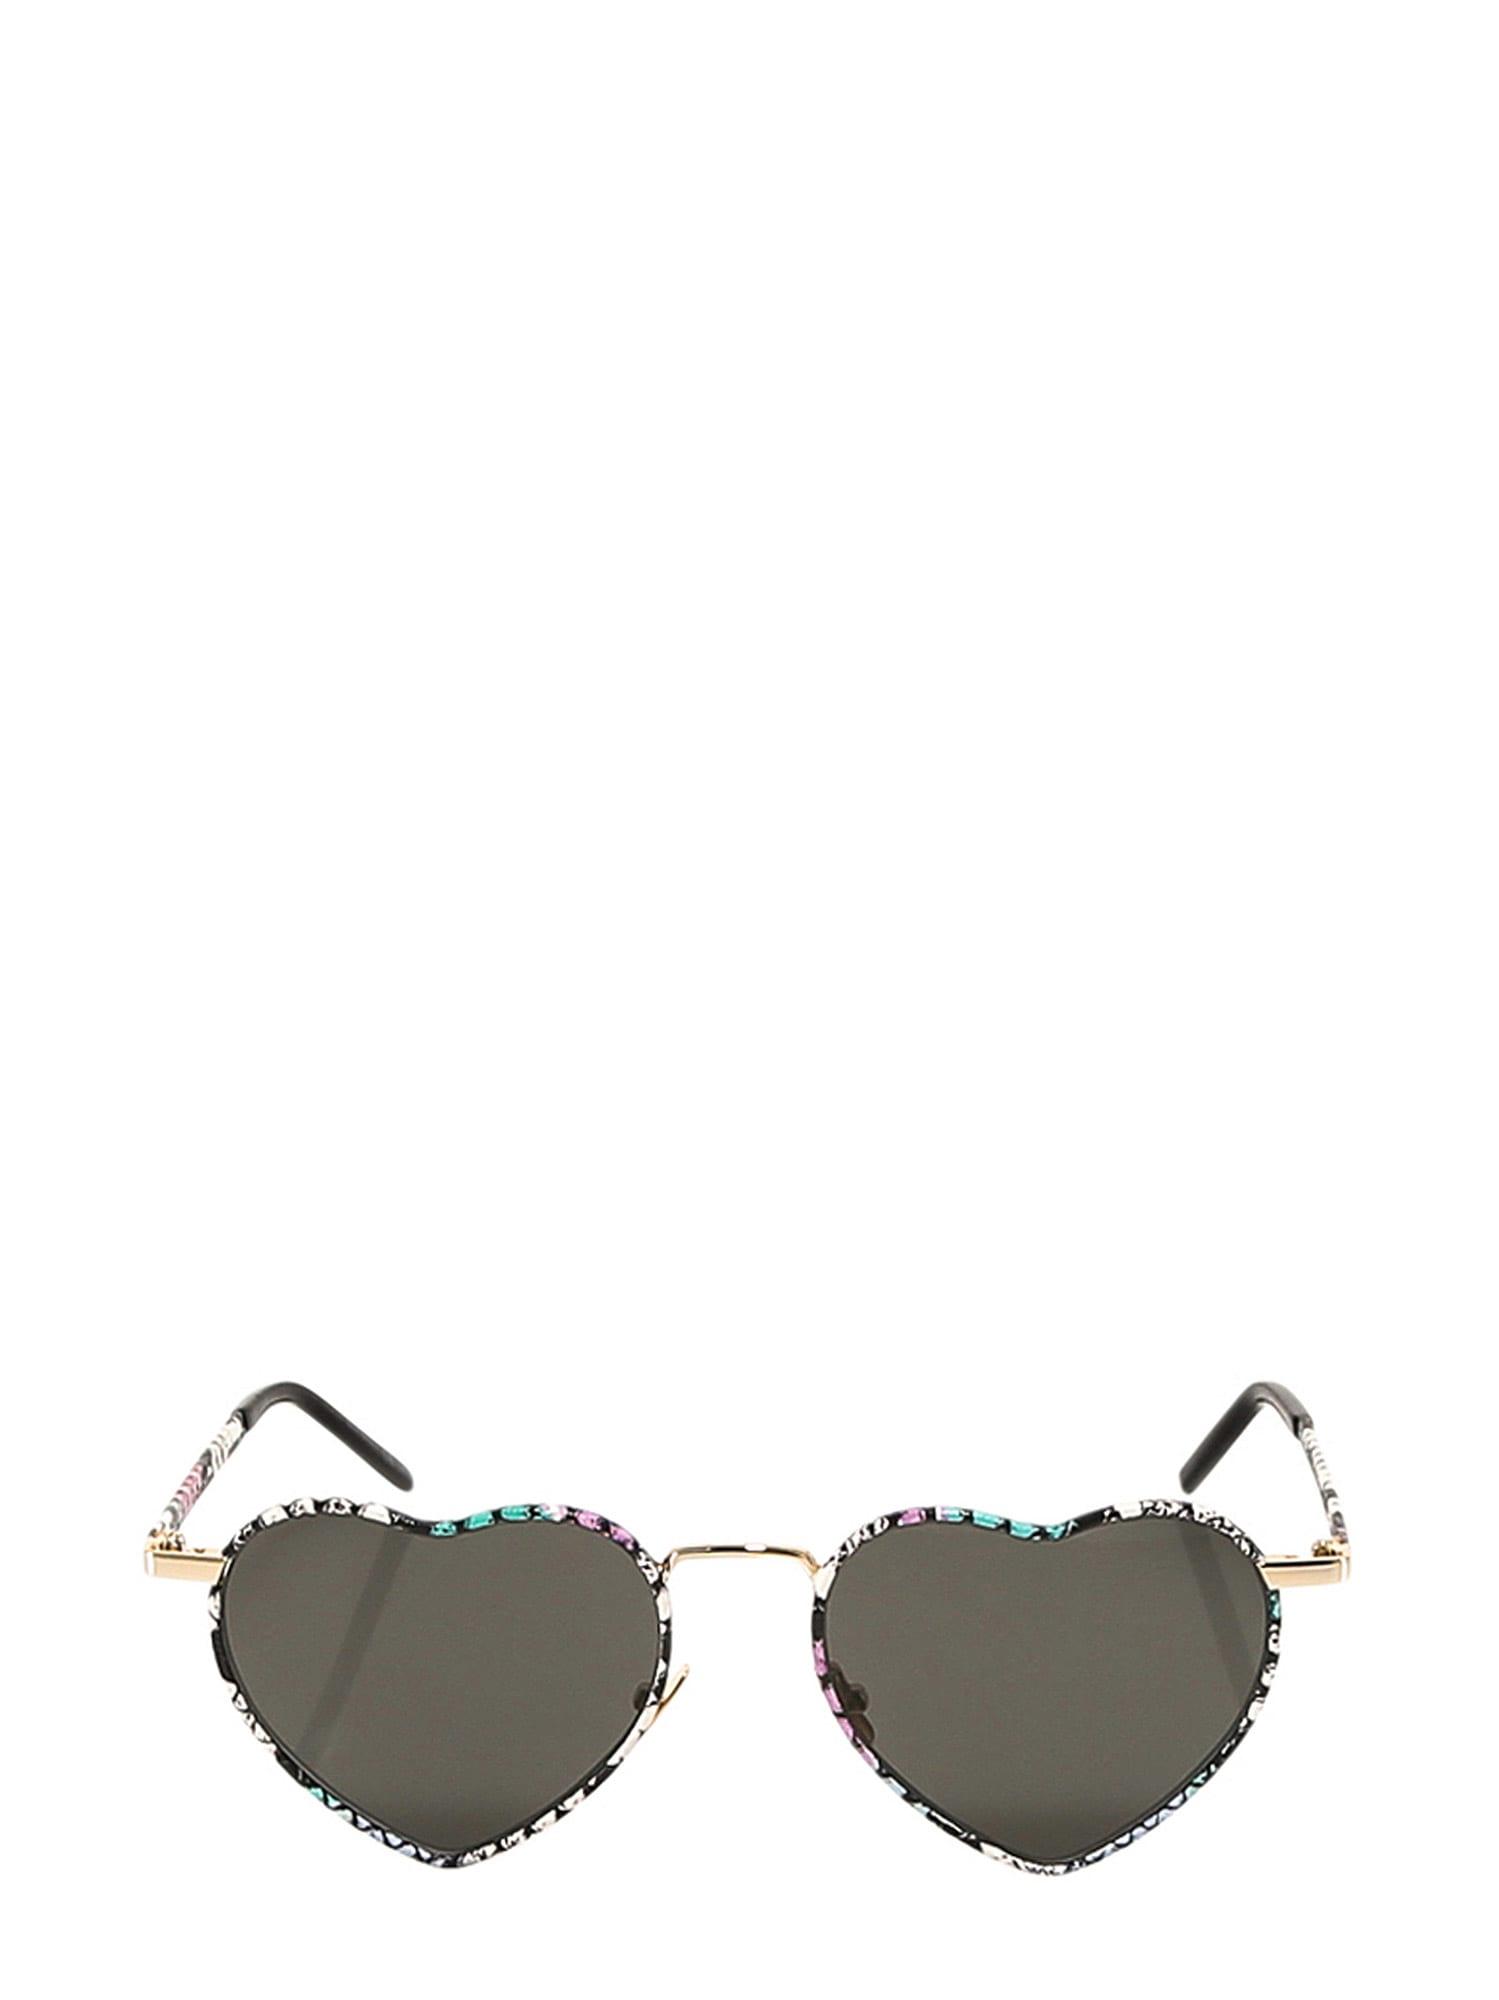 Saint Laurent Sunglasses SUNGLASSES